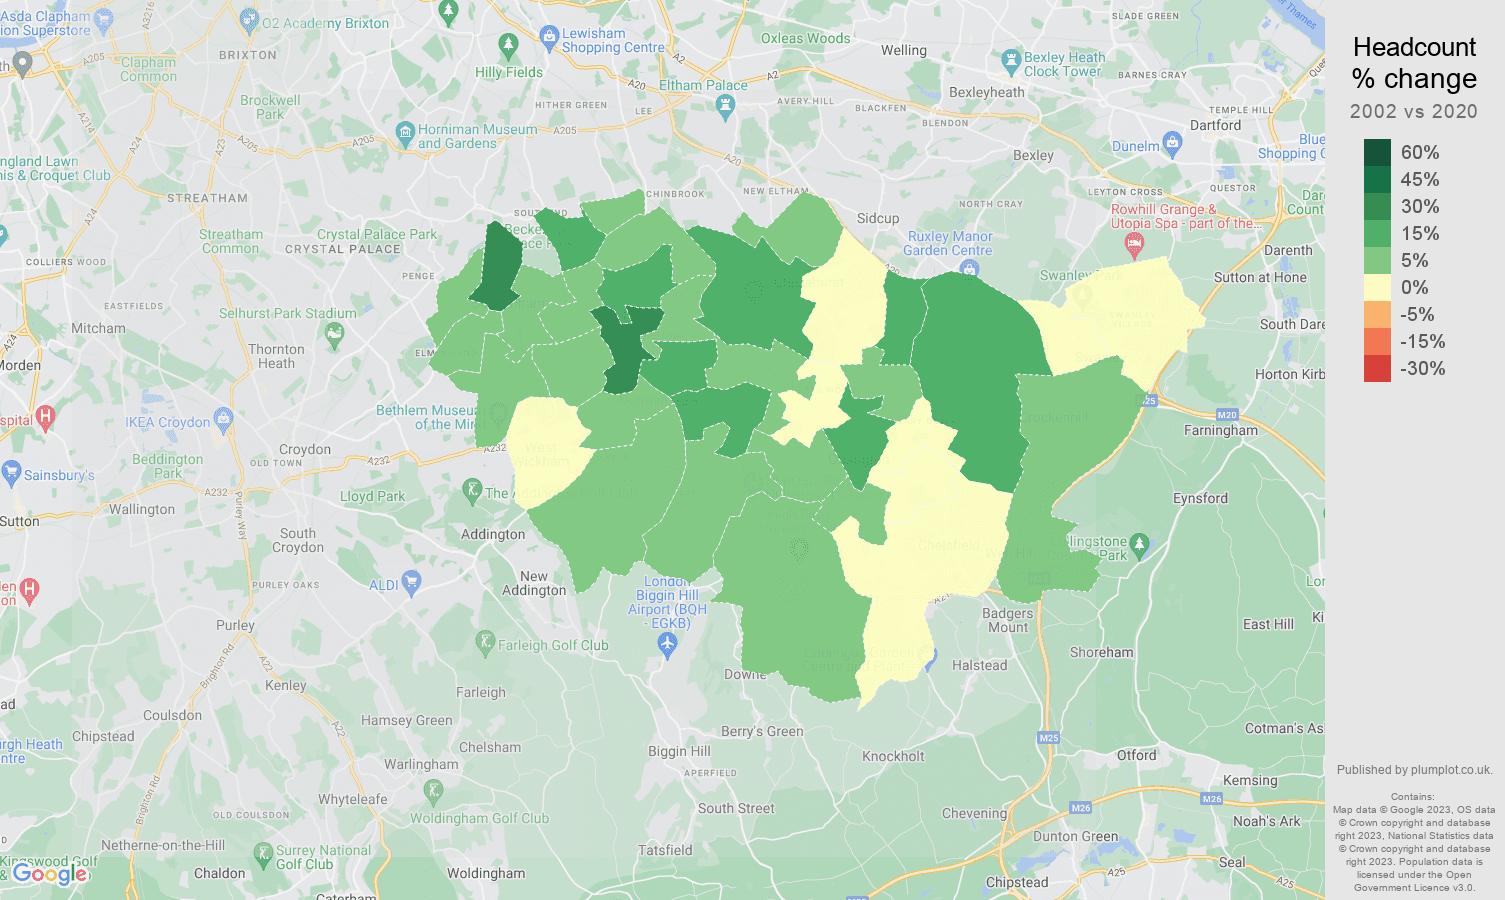 Bromley headcount change map